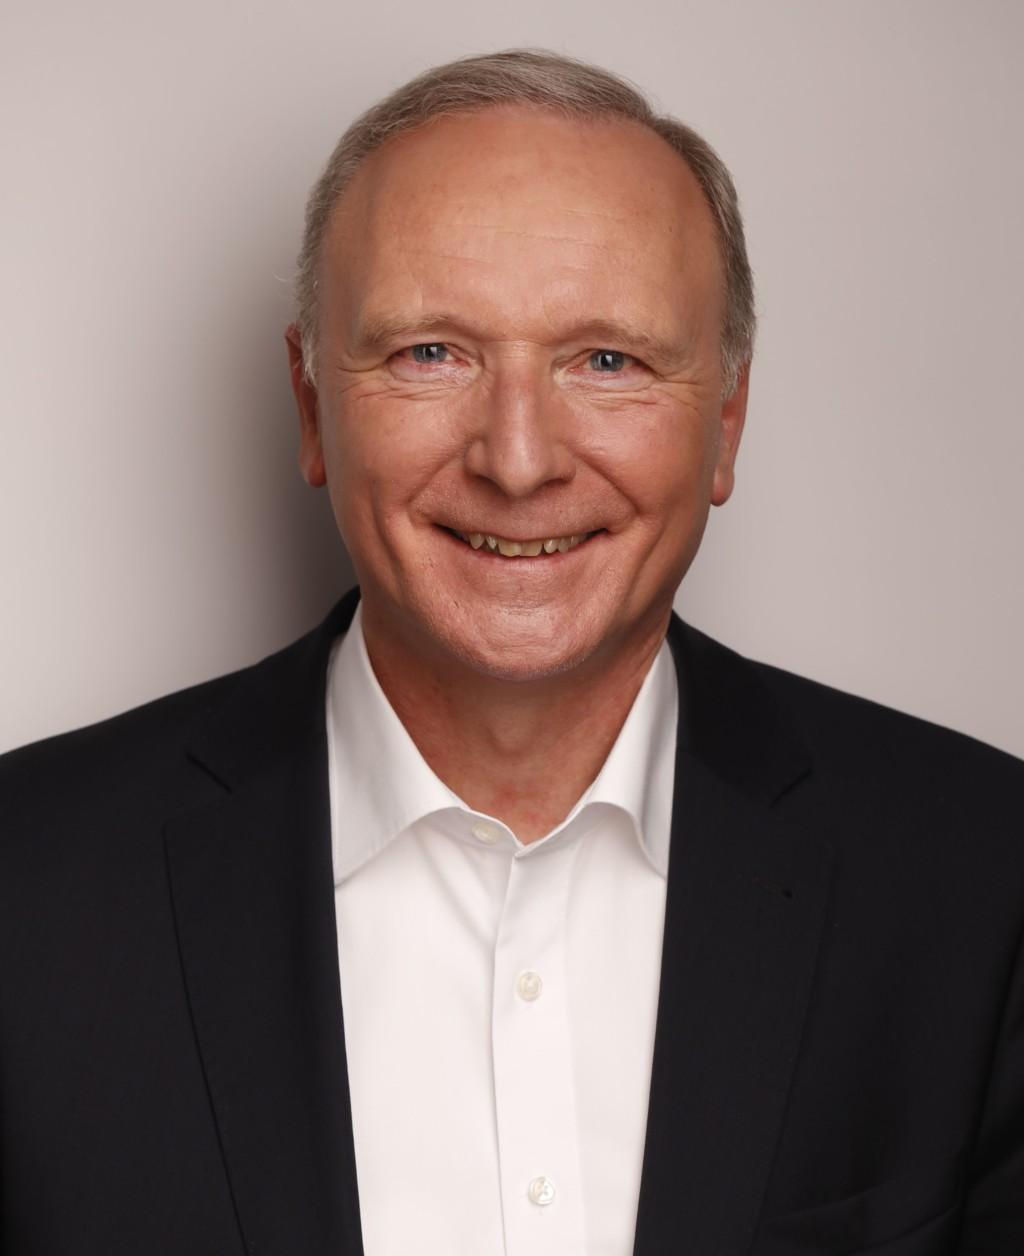 Bernd Westphal (MdB)